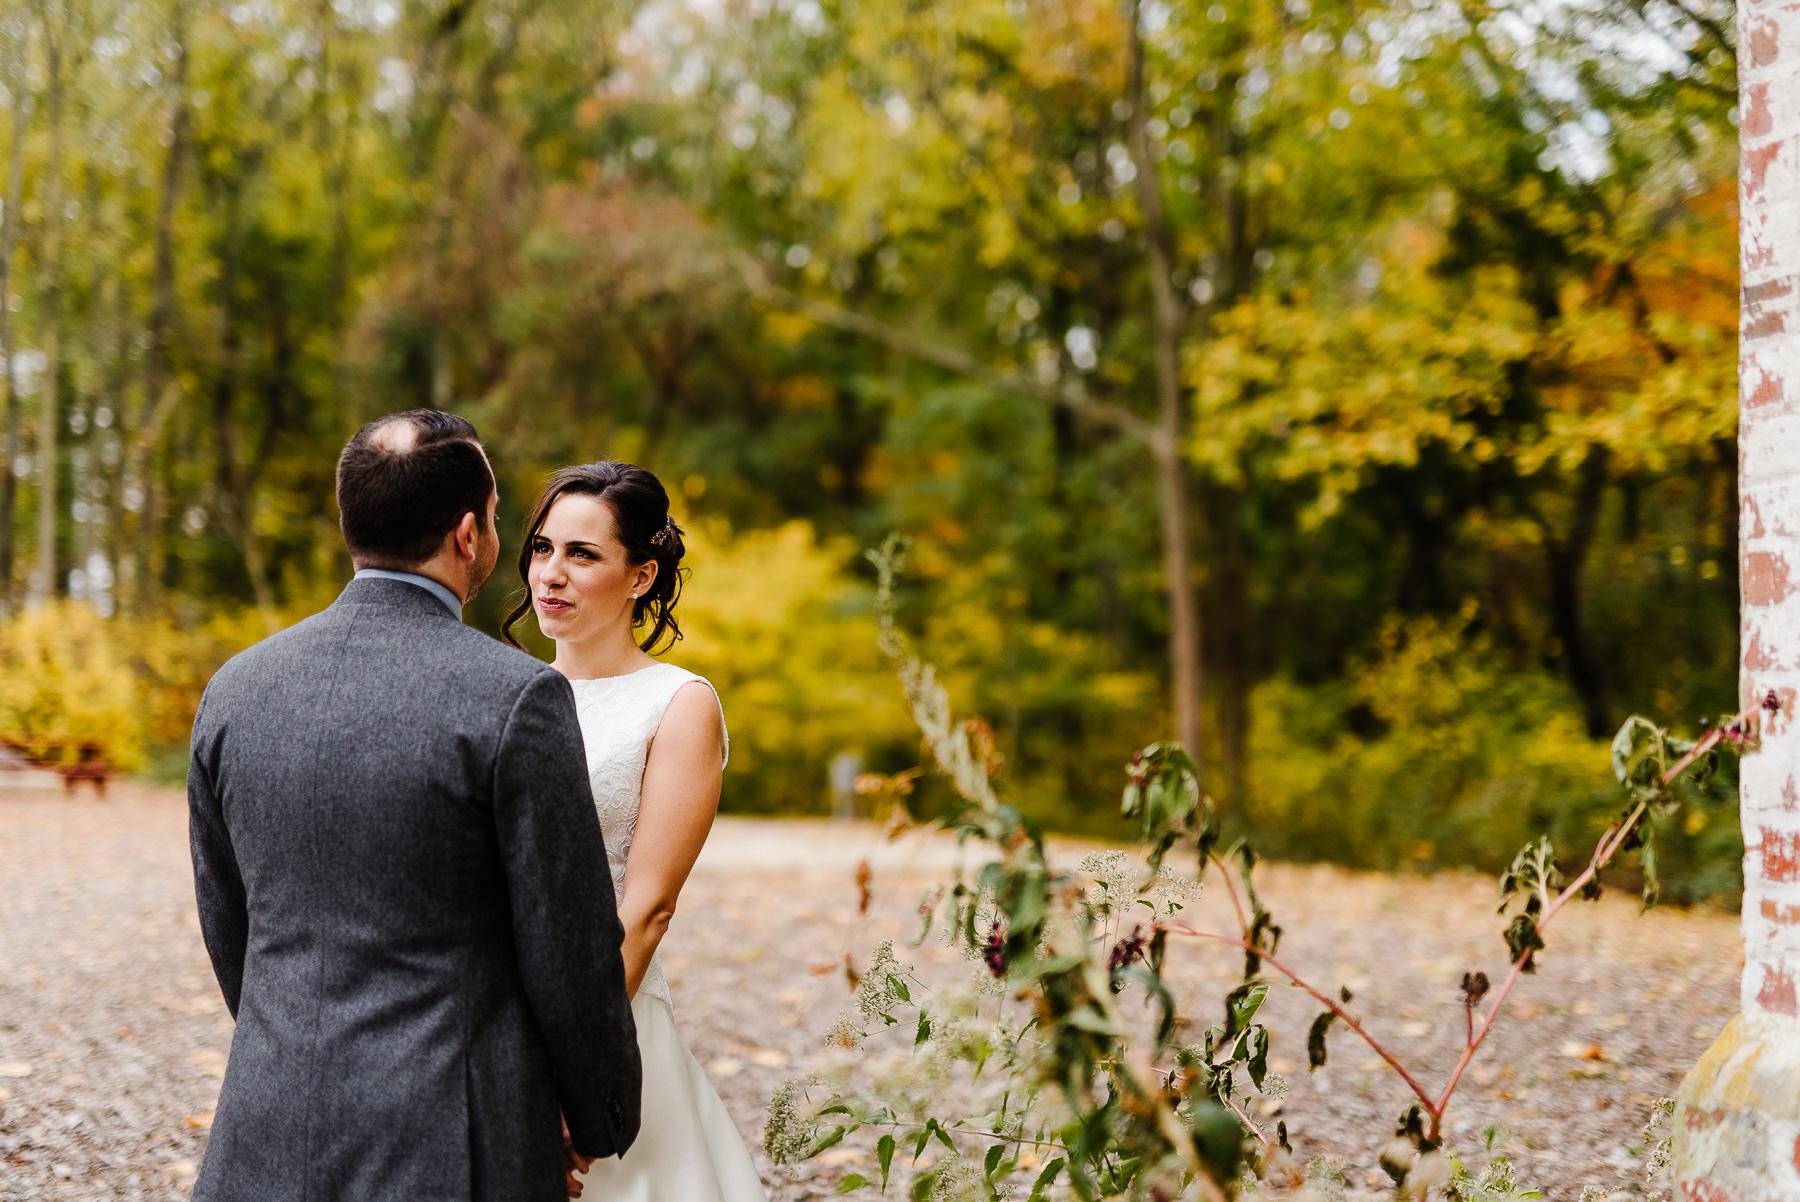 29-Laurita Winery Wedding New Jersey Wedding Photographer Laurita Winery Weddings Longbrook Photography.jpg